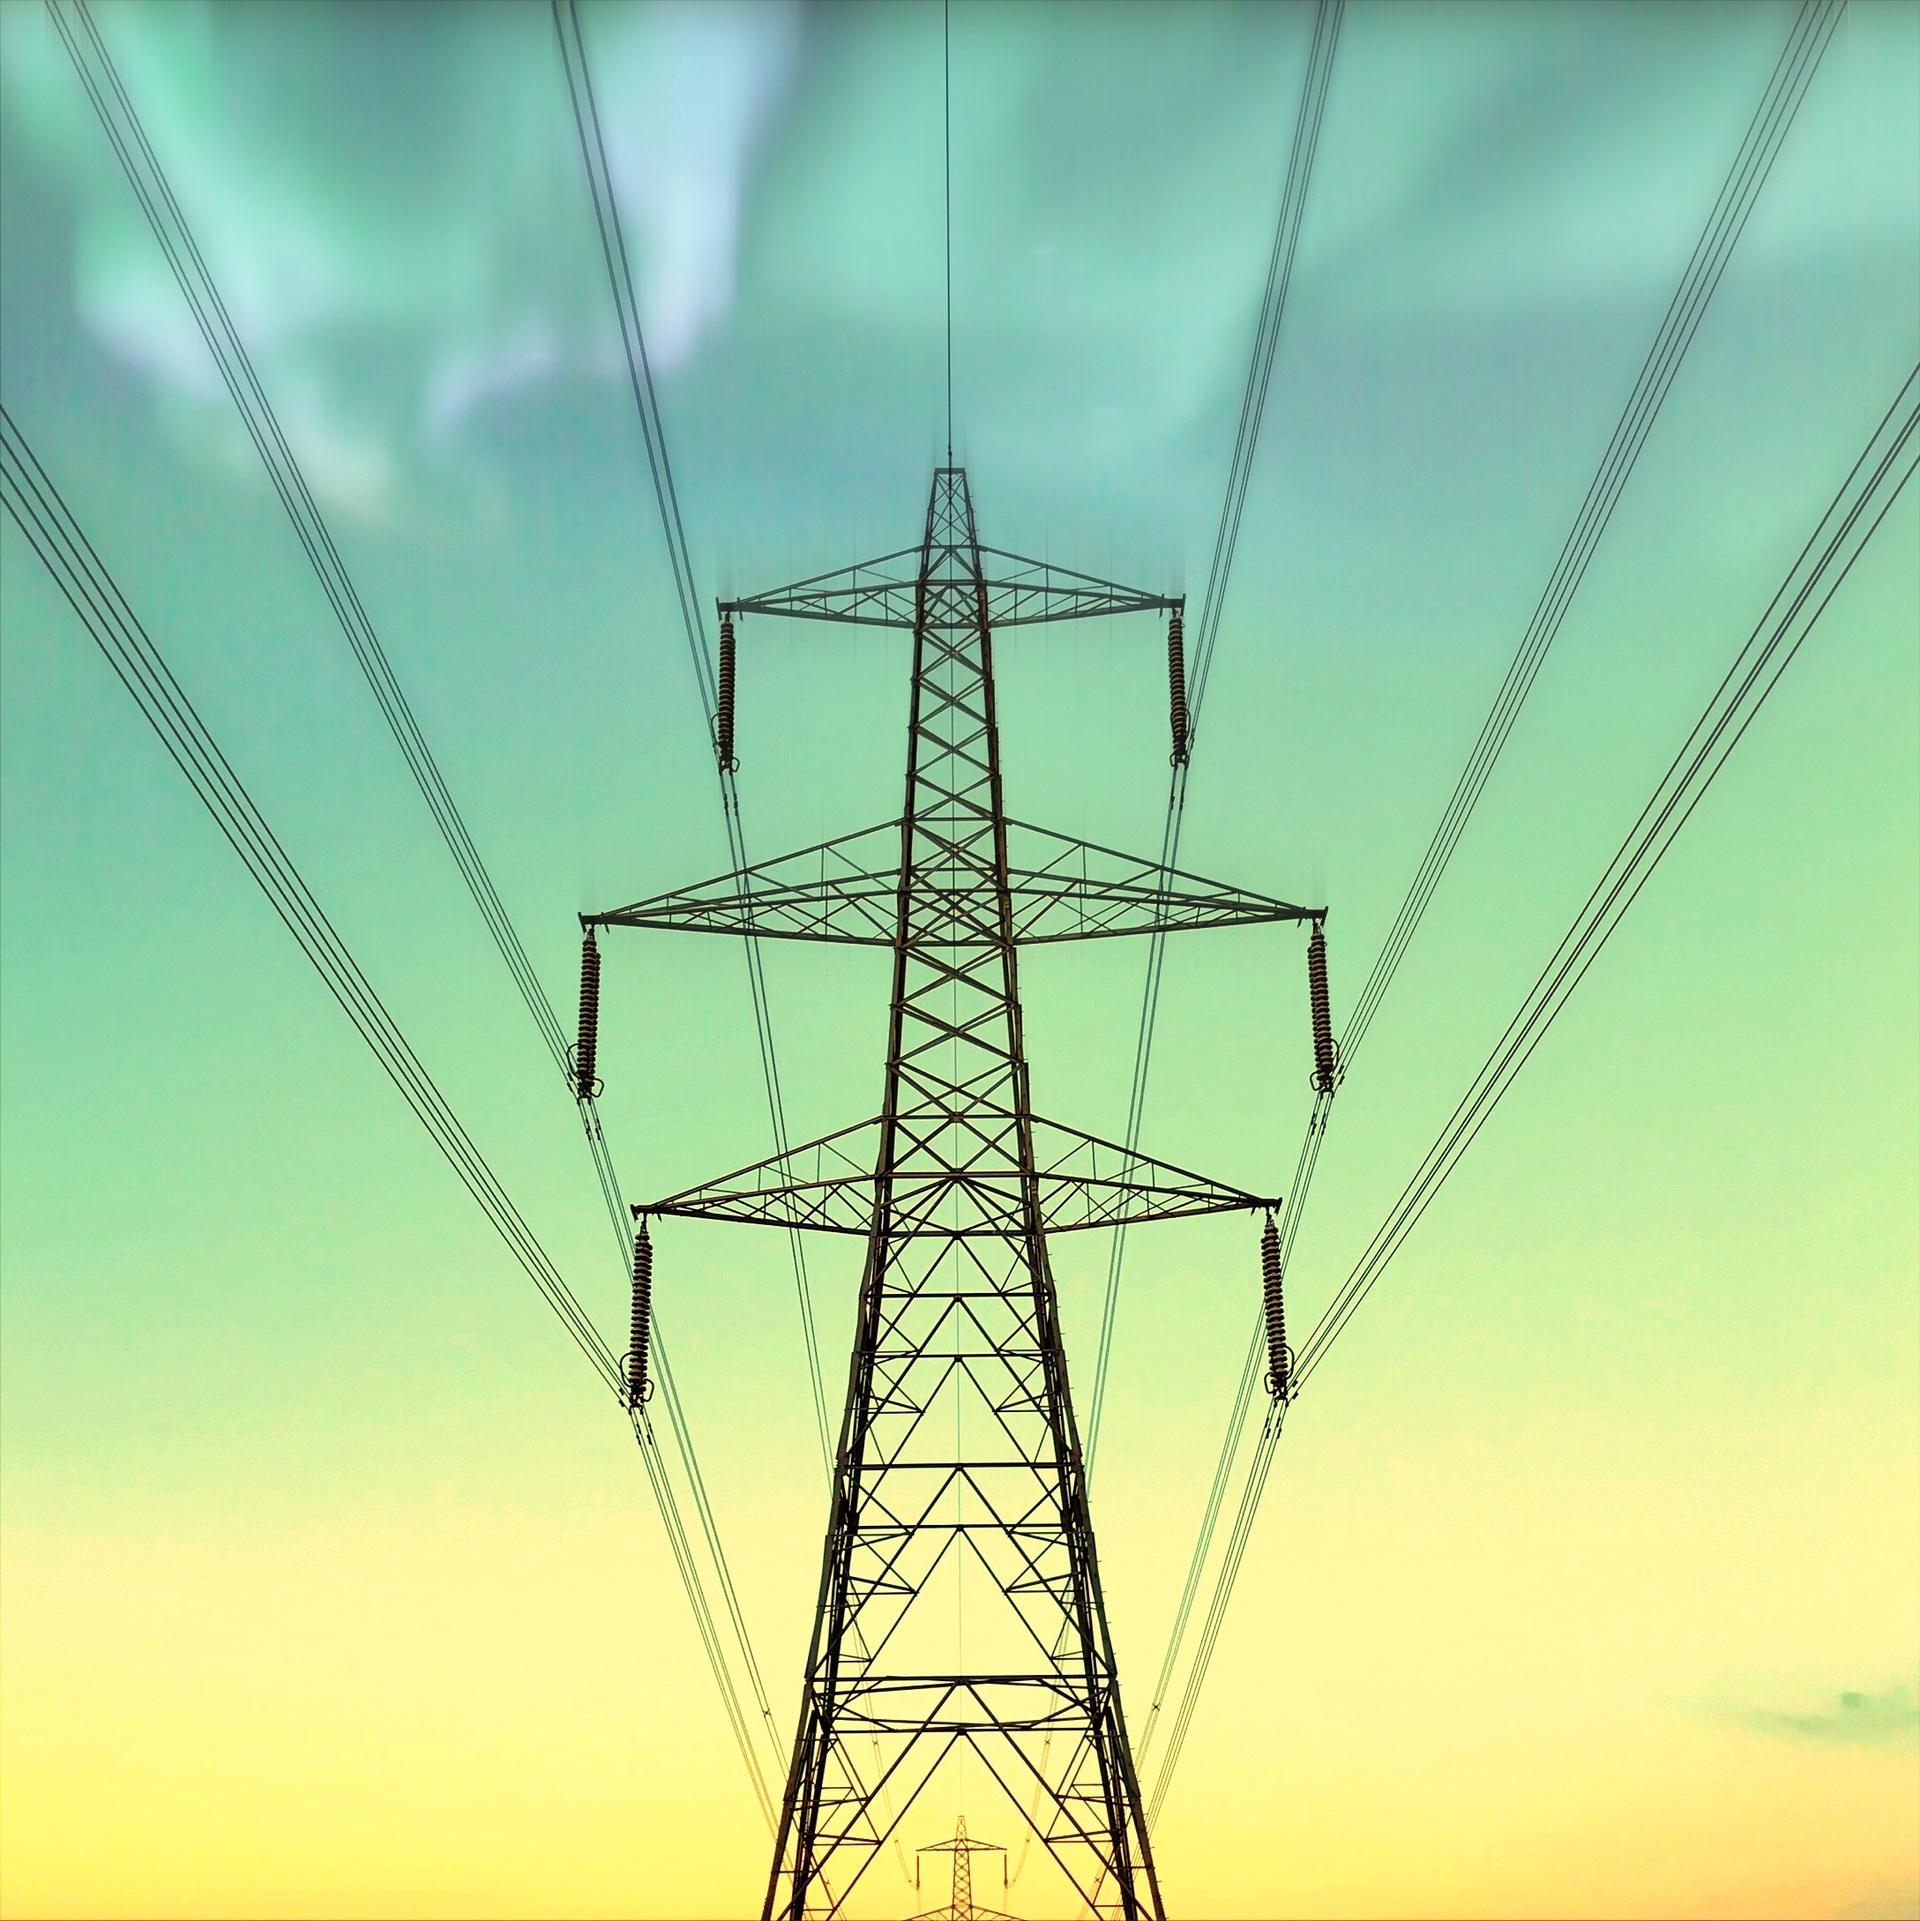 Pylon abstract    no person, energetic, grid, generator